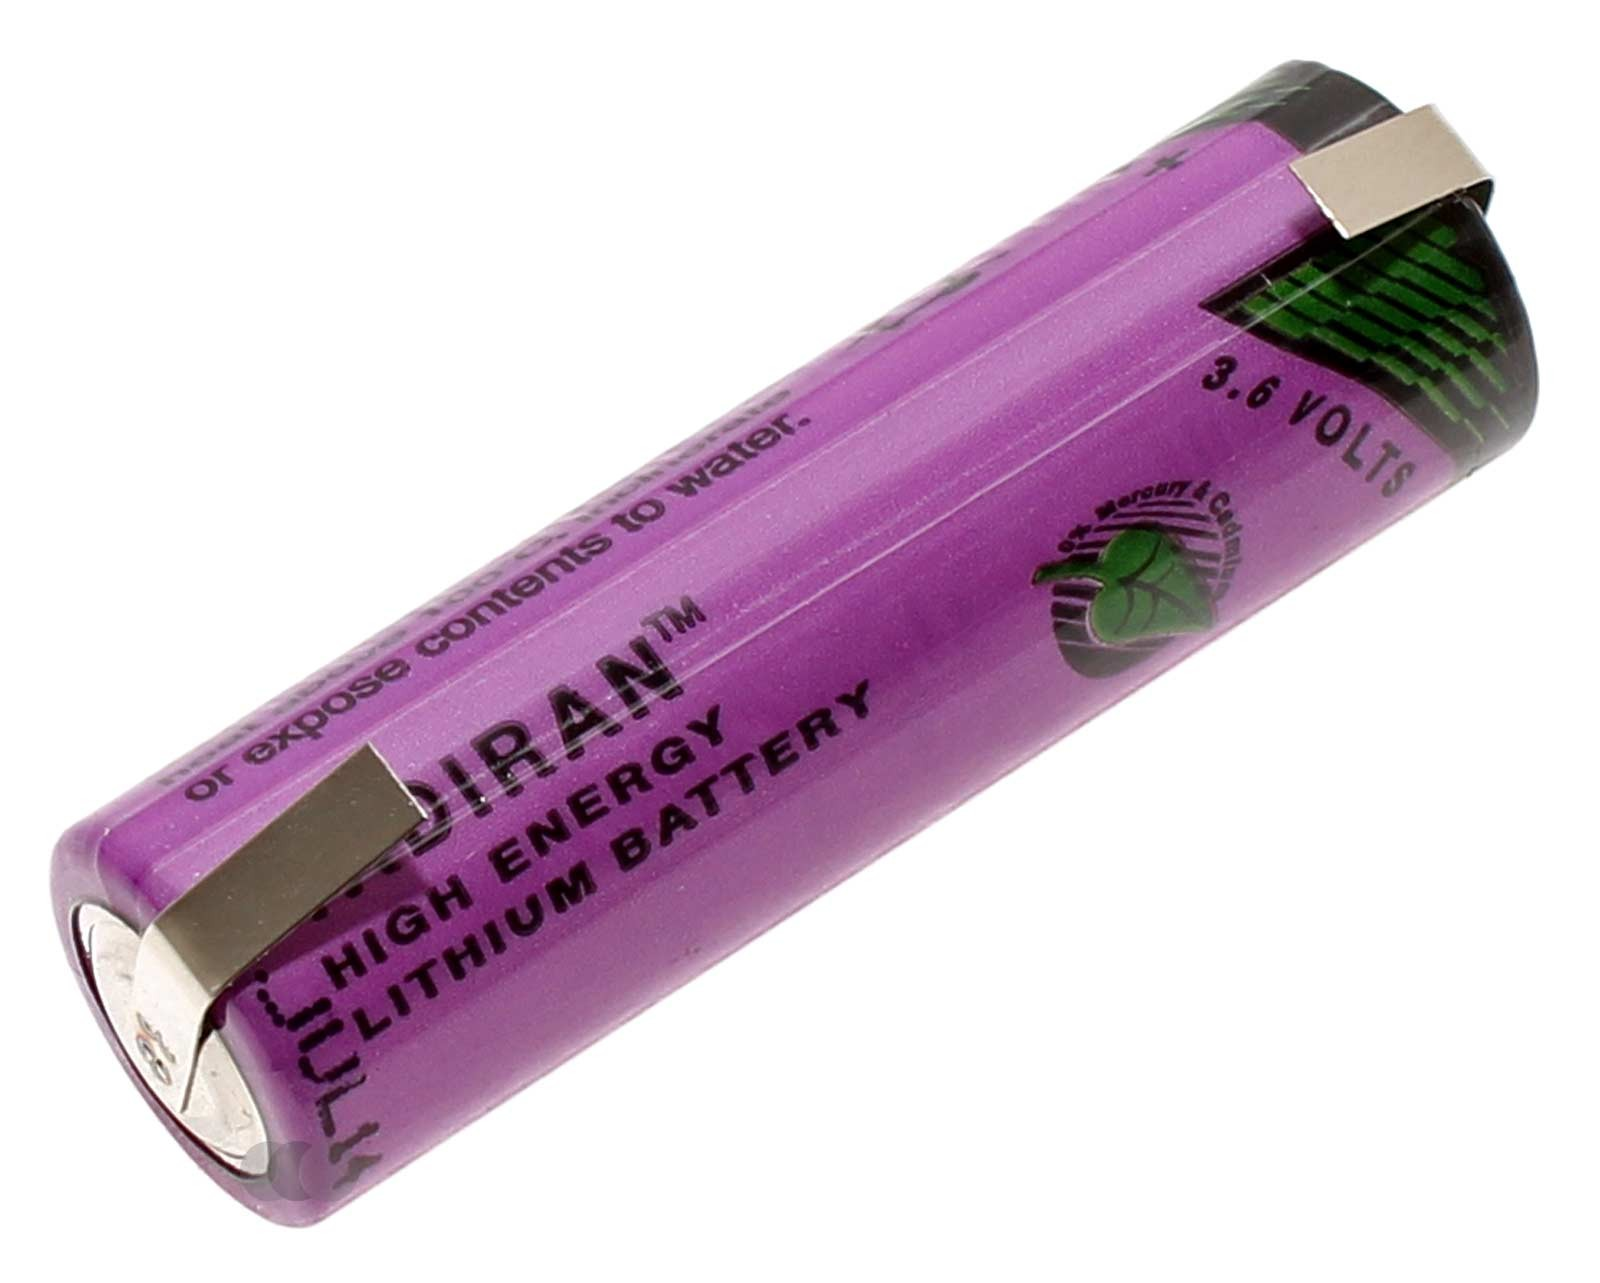 Tadiran SL-760 Spezial-Batterie Mignon AA Lithium-Thionylchlorid Li-SOCl2 Industriezelle mit 3,6 Volt und 2200mAh Kapazität, mit U-Lötfahne